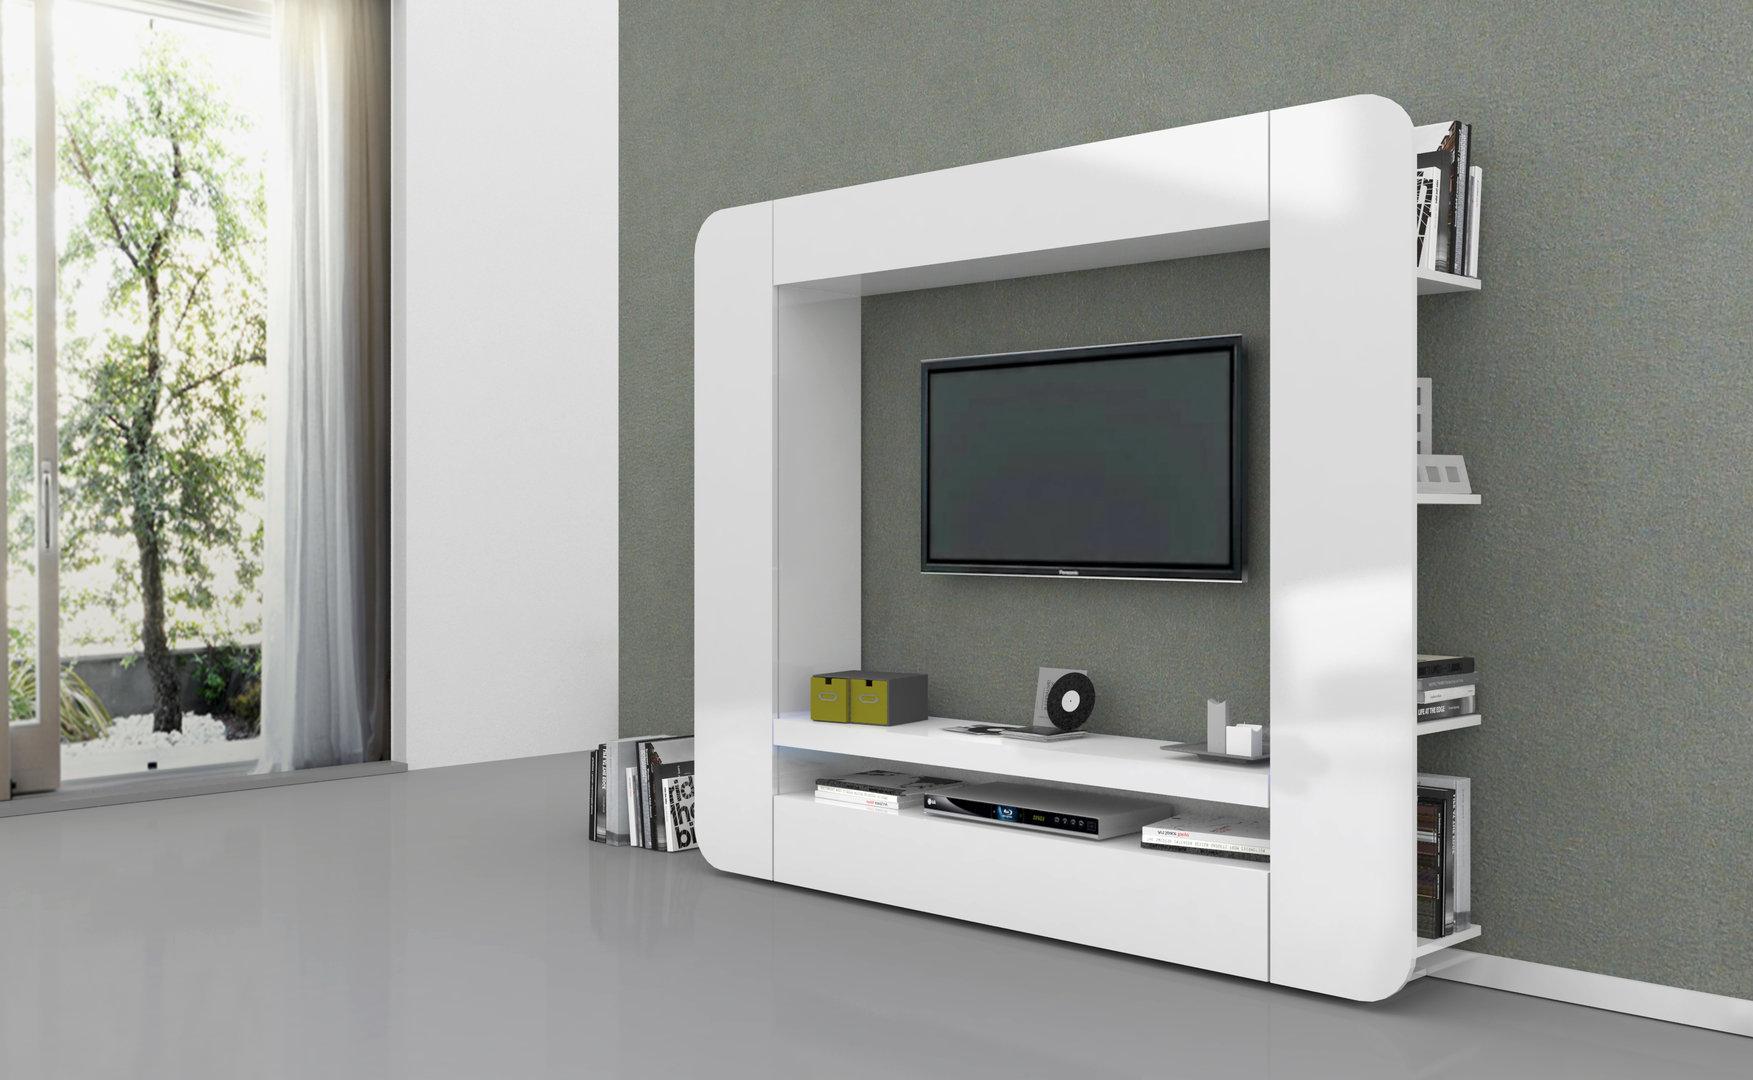 Awesome mobile porta tv moderno design pictures - Porta tv design ...